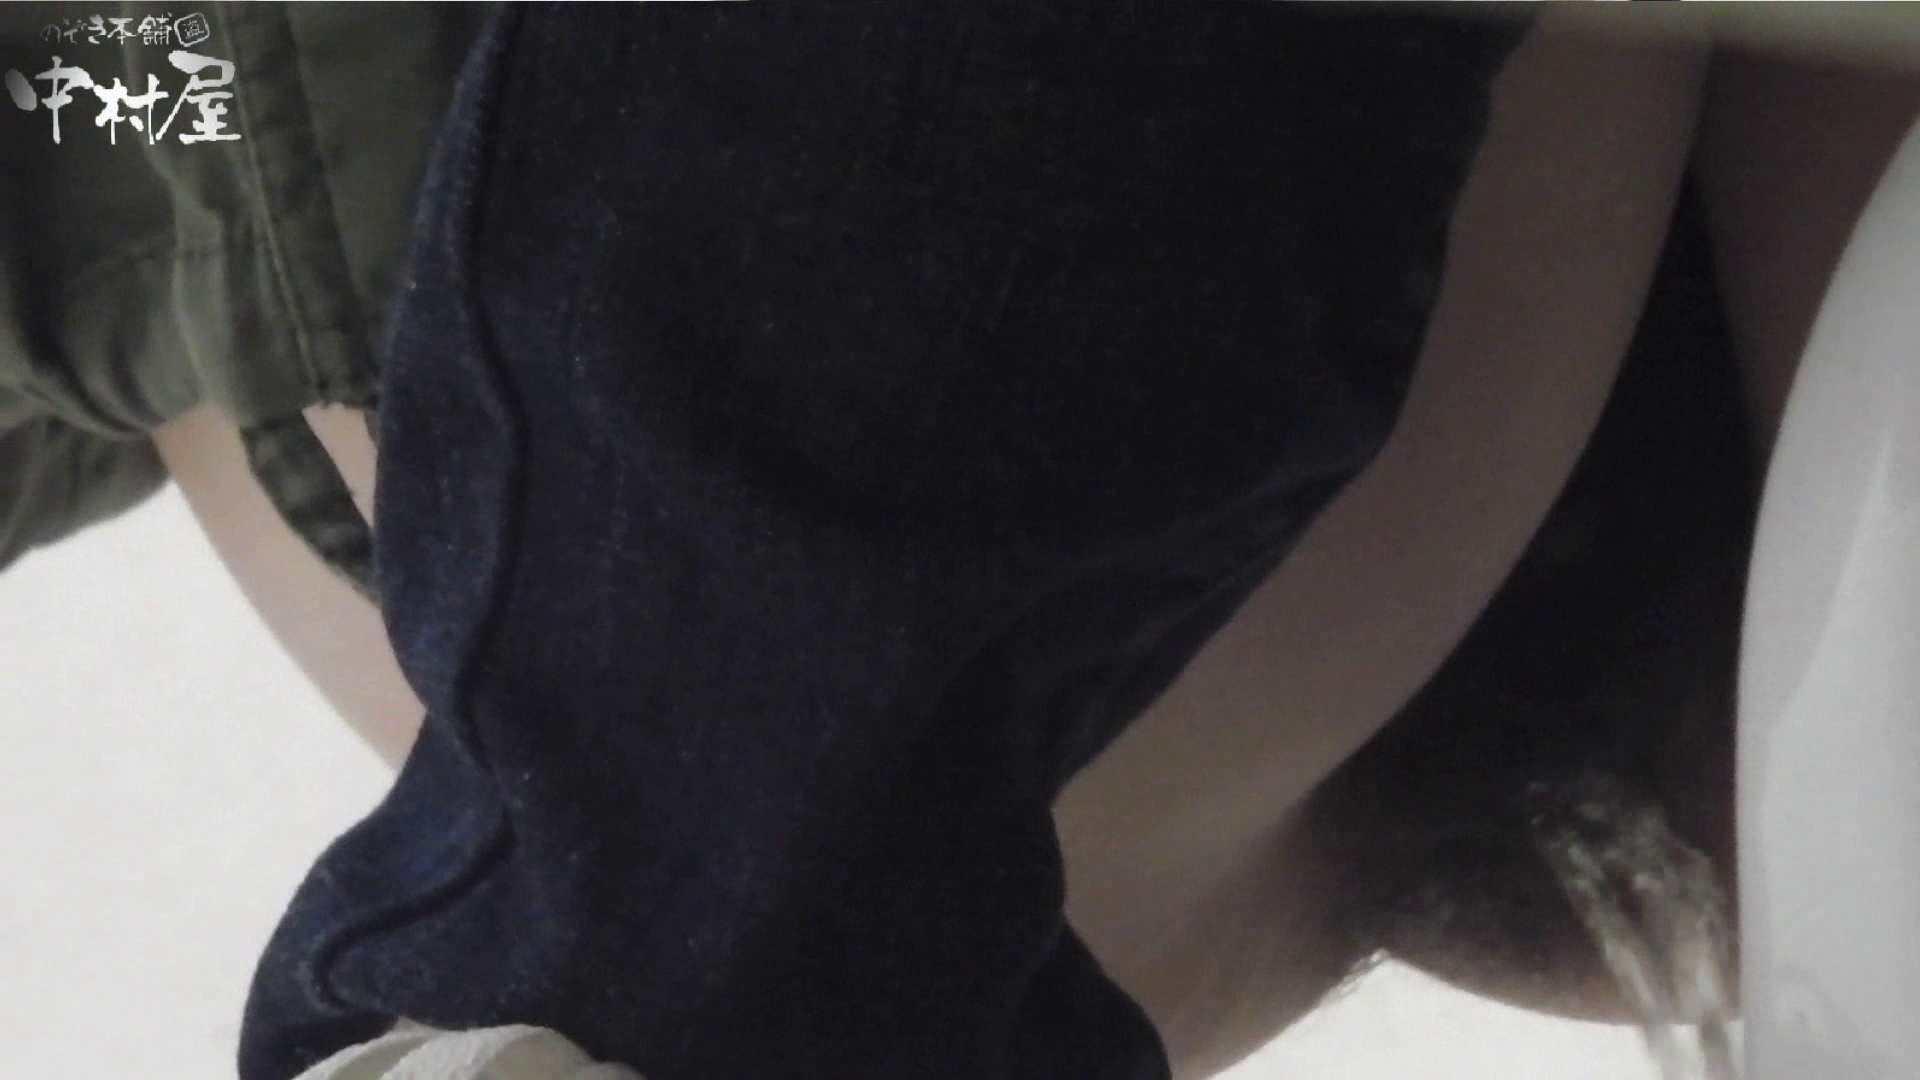 vol.25 命がけ潜伏洗面所! 咥えタオルは剛毛の証!?後編 洗面所突入 われめAV動画紹介 77pic 55